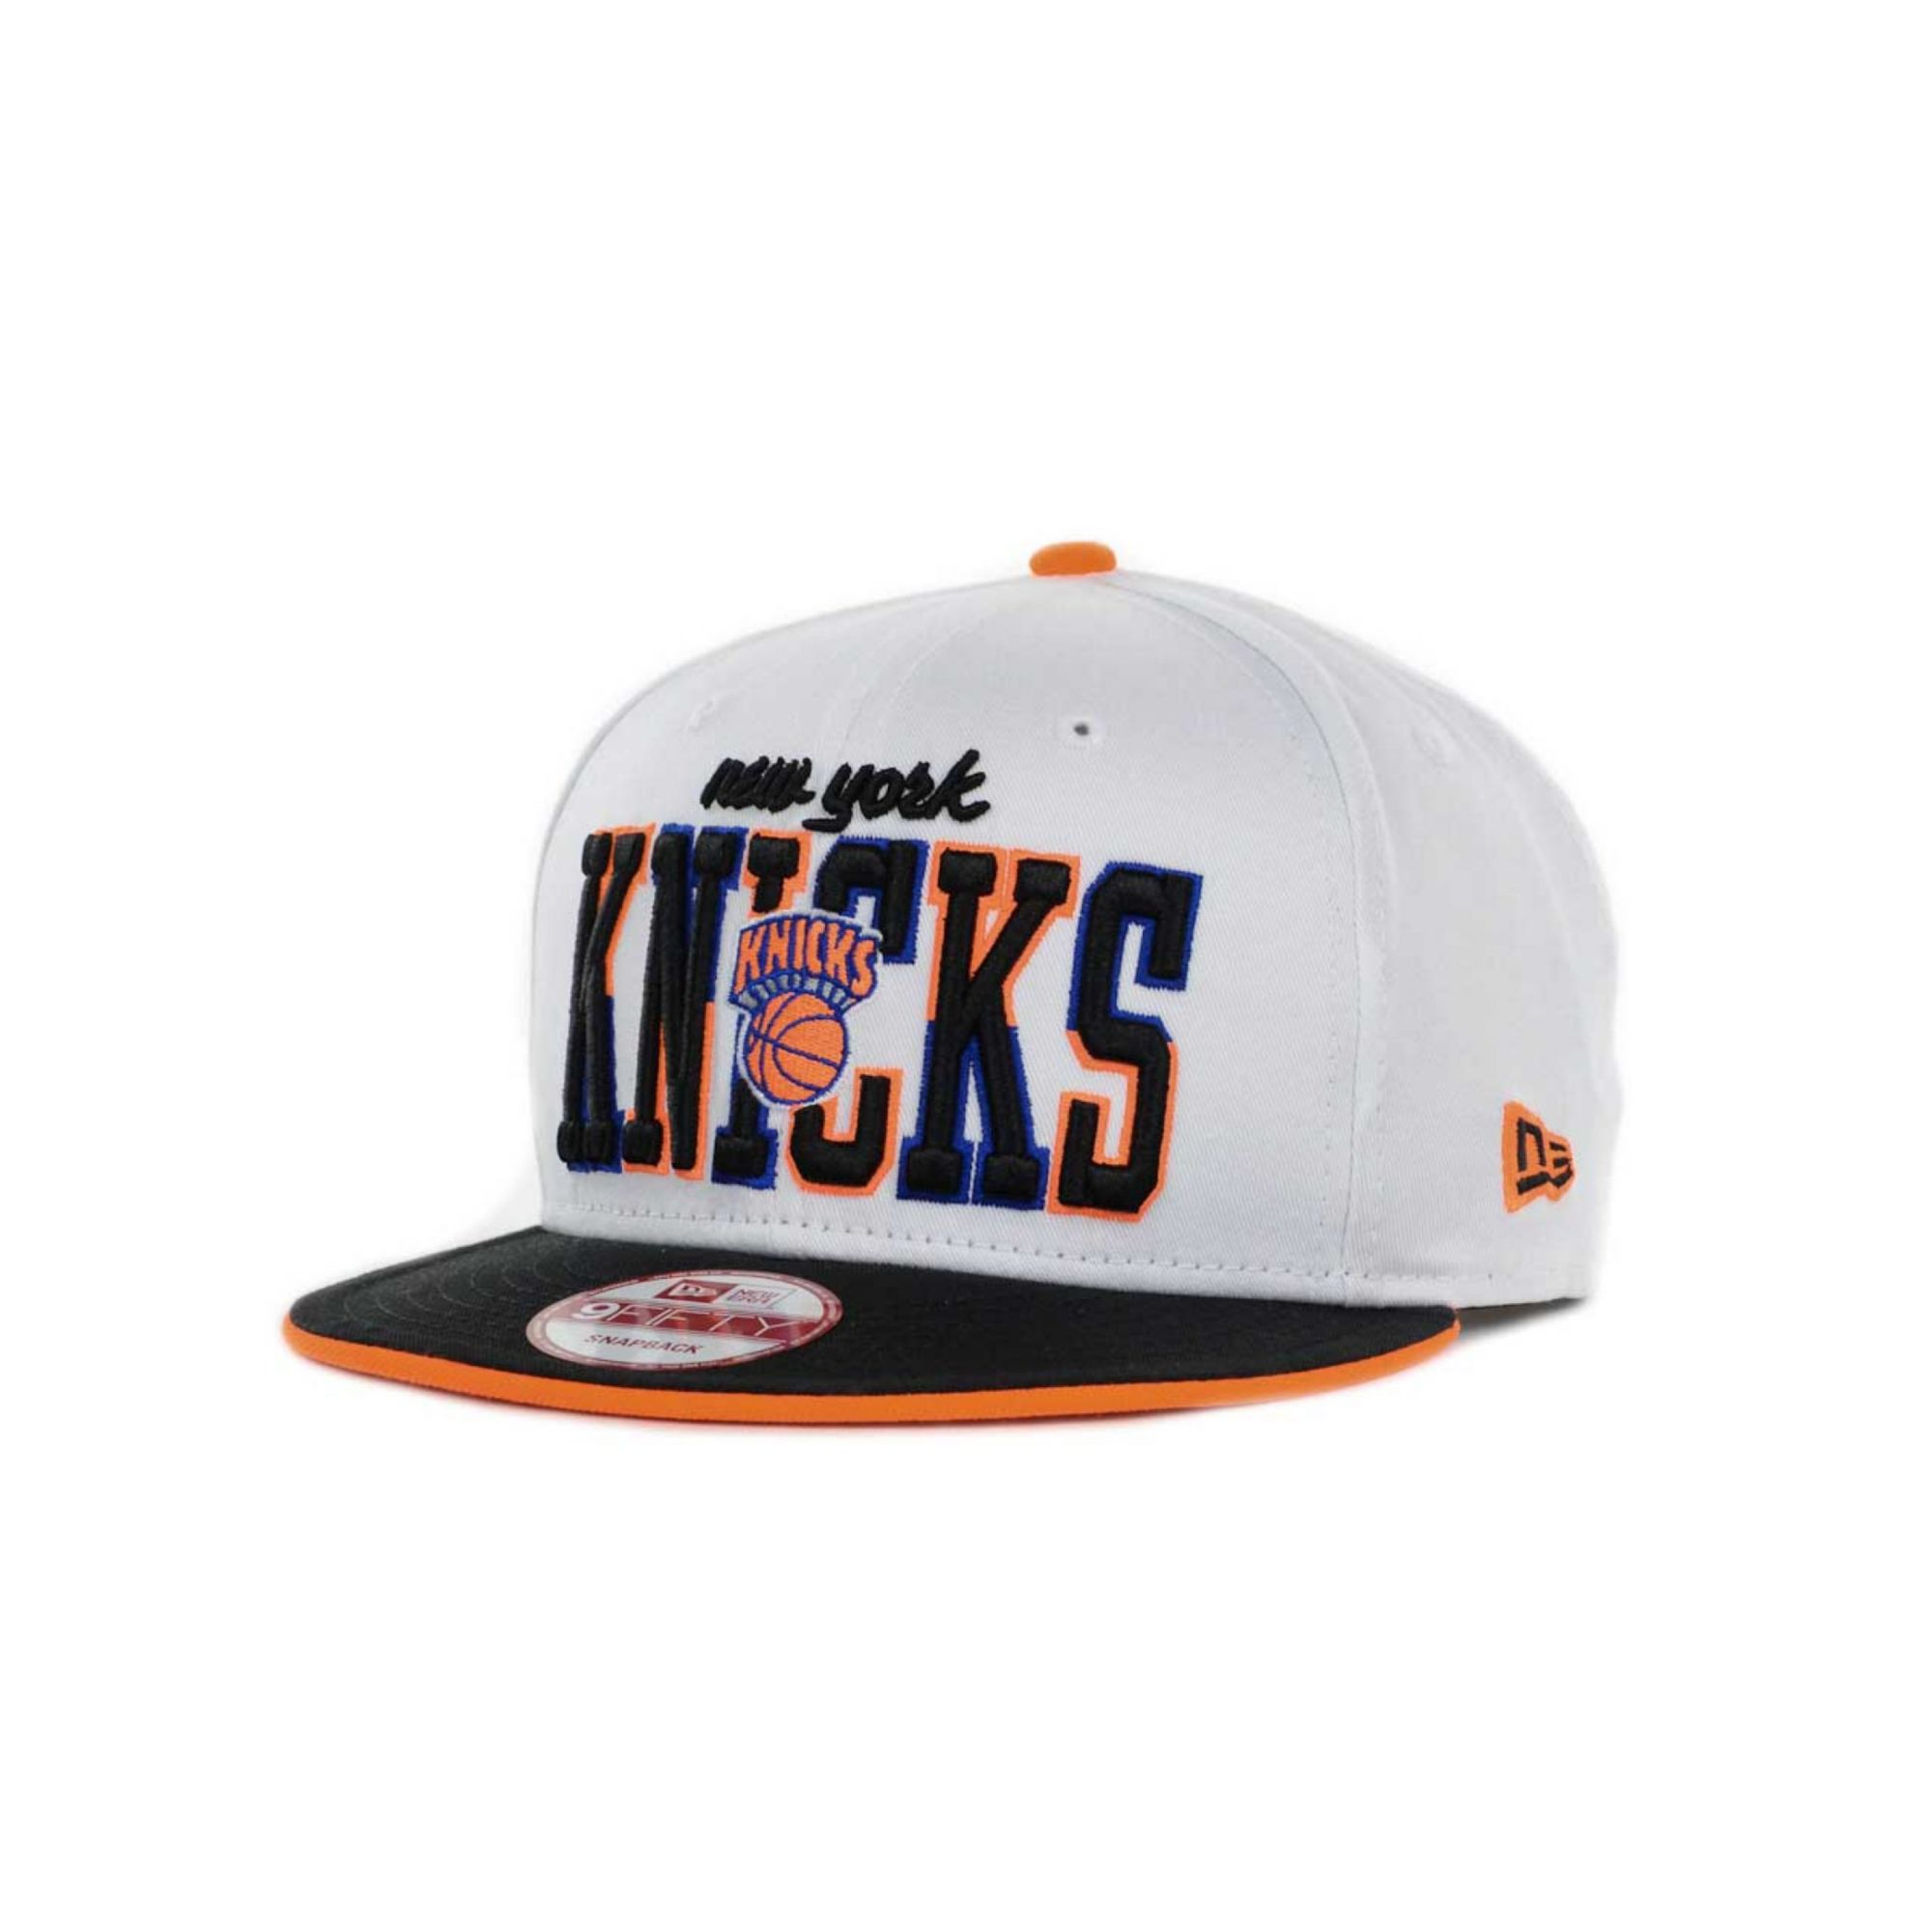 best loved be974 14fda KTZ New York Knicks Nba Hardwood Classics Pump Fake Snapback 9fifty ...